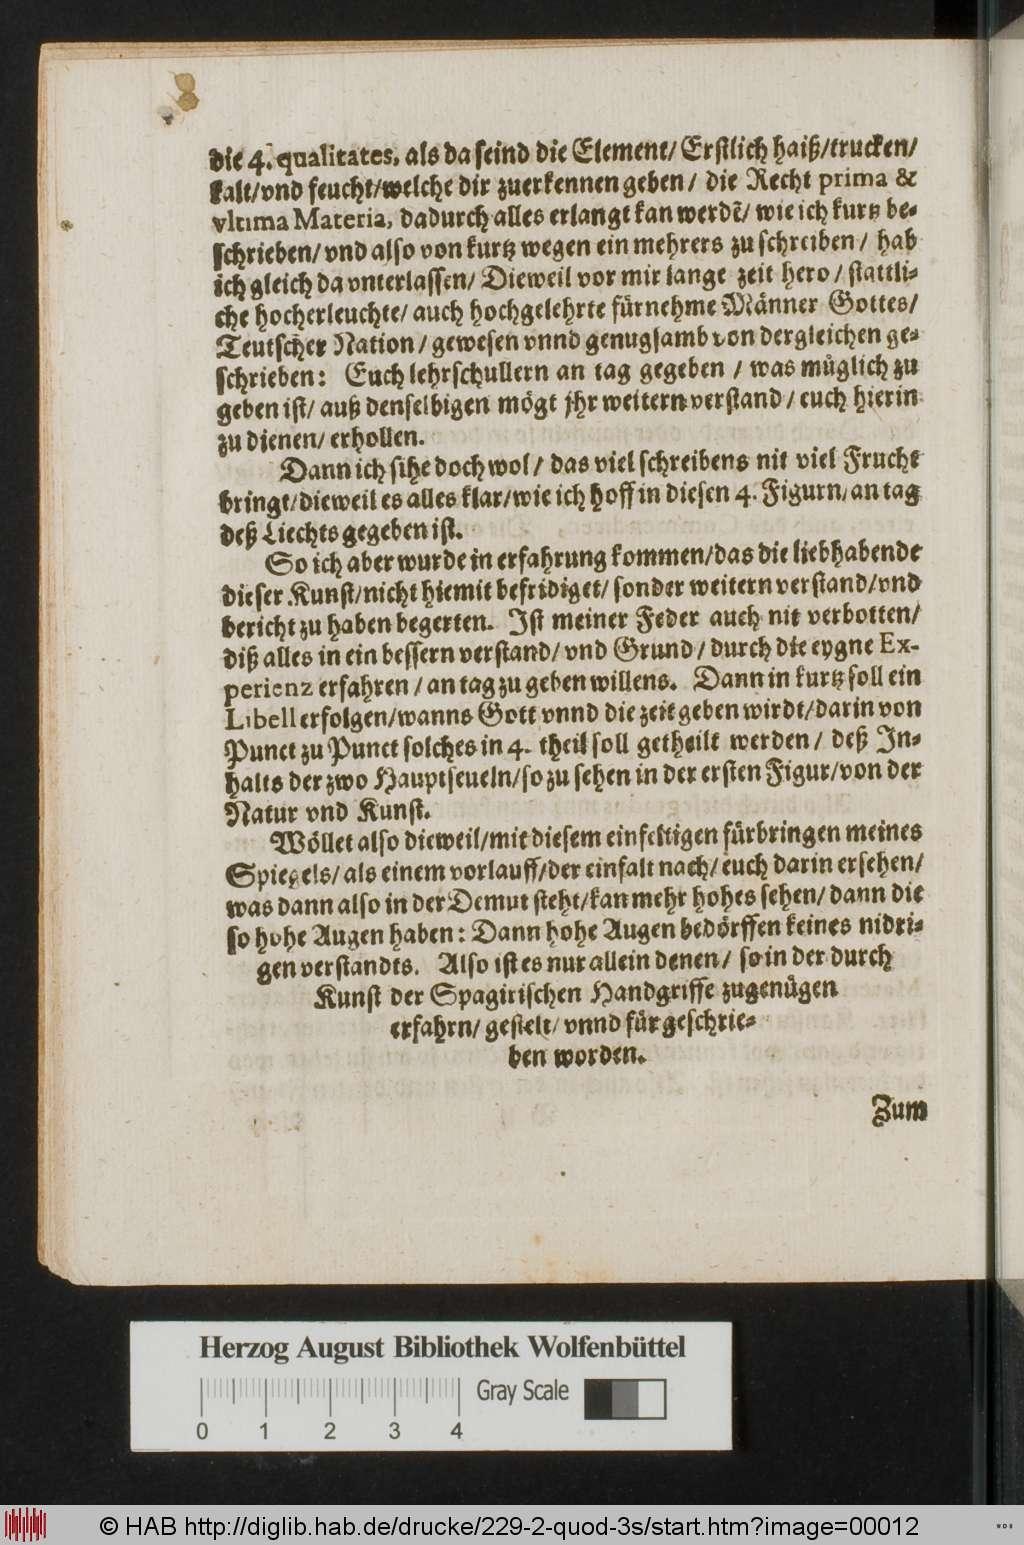 http://diglib.hab.de/drucke/229-2-quod-3s/00012.jpg